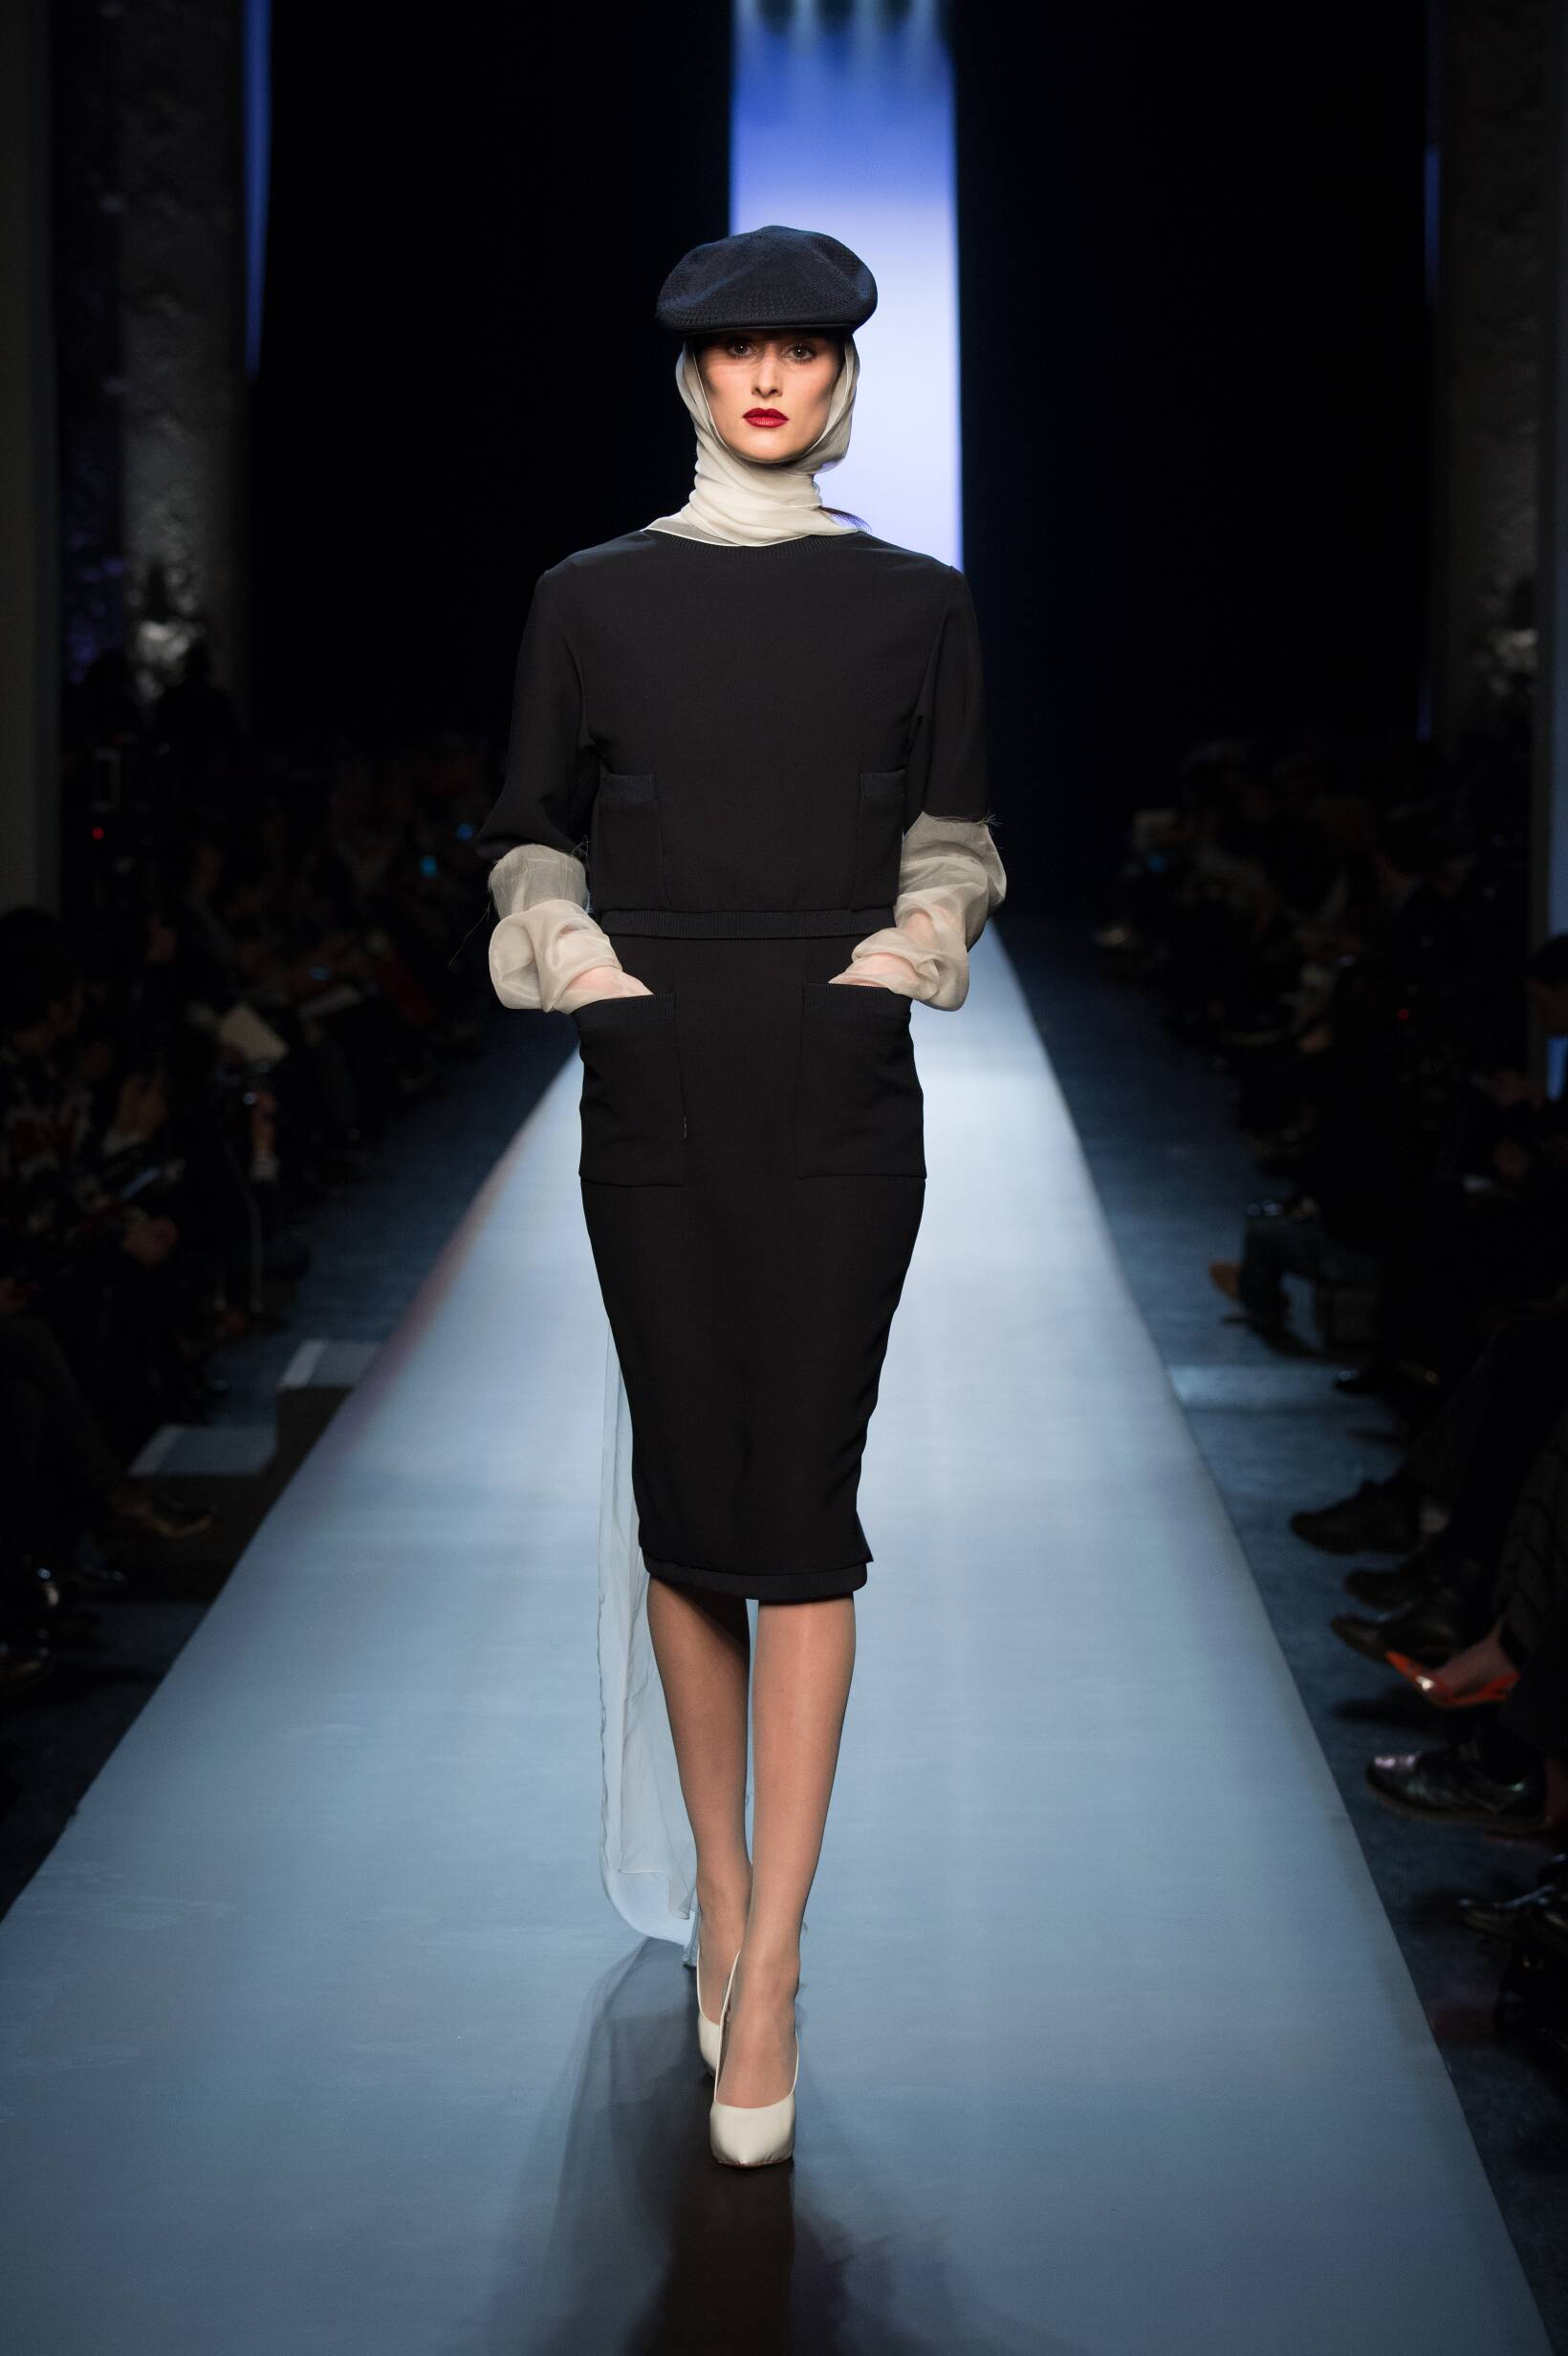 Fashion Woman Model Jean Paul Gaultier Haute Couture Collection Catwalk